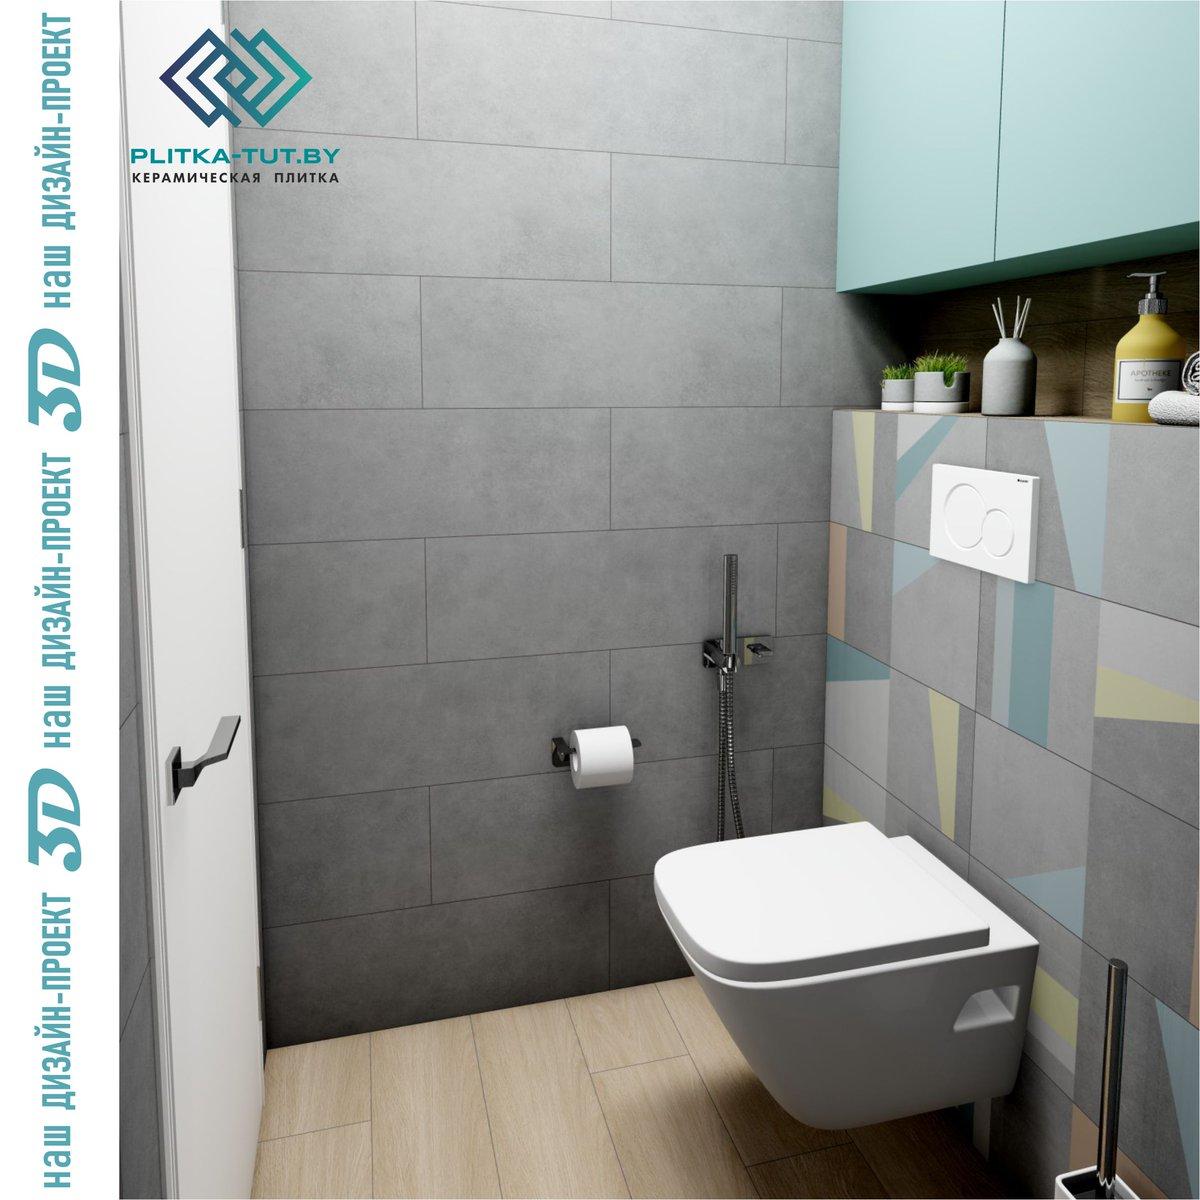 Туалет серый бетон книга о бетоне